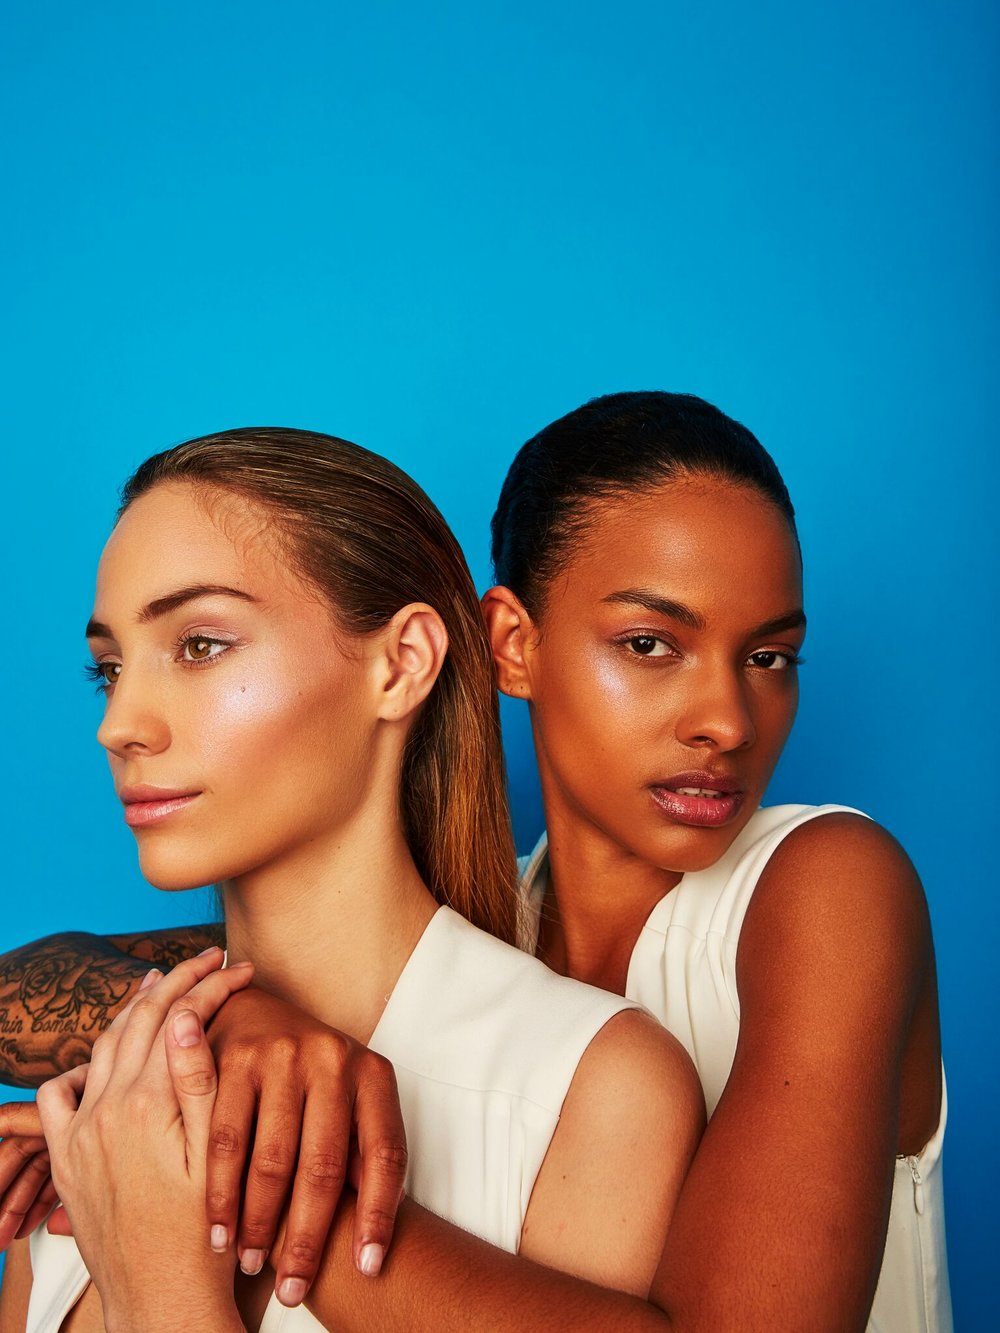 Photographer: Sergio Necoechea | Model(s): Agustina Tisler & Jordyn Renee | Hair: Brianna Barela | Makeup by Ashley Tani